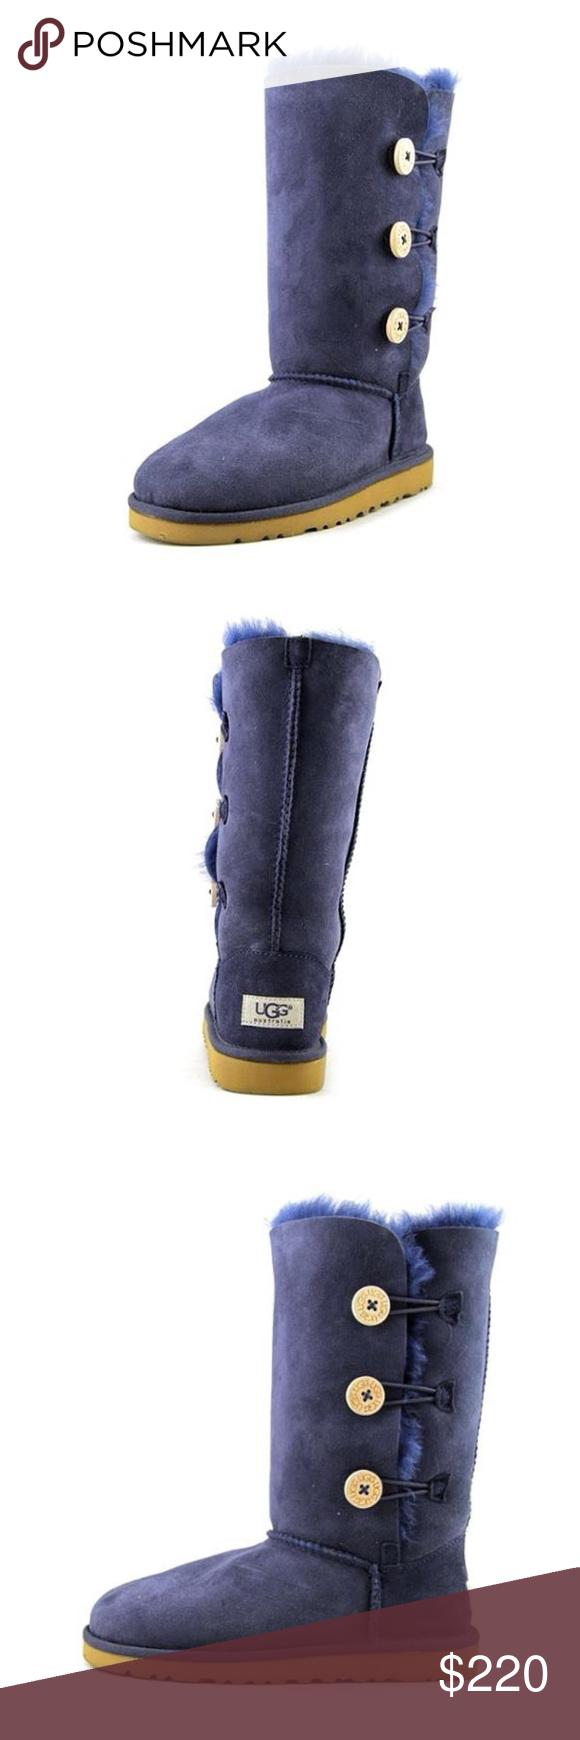 326d4b2f912 Kid's UGG Boots Ugg Bailey Button Triplet Navy Blue Model: 1962K-NVB ...